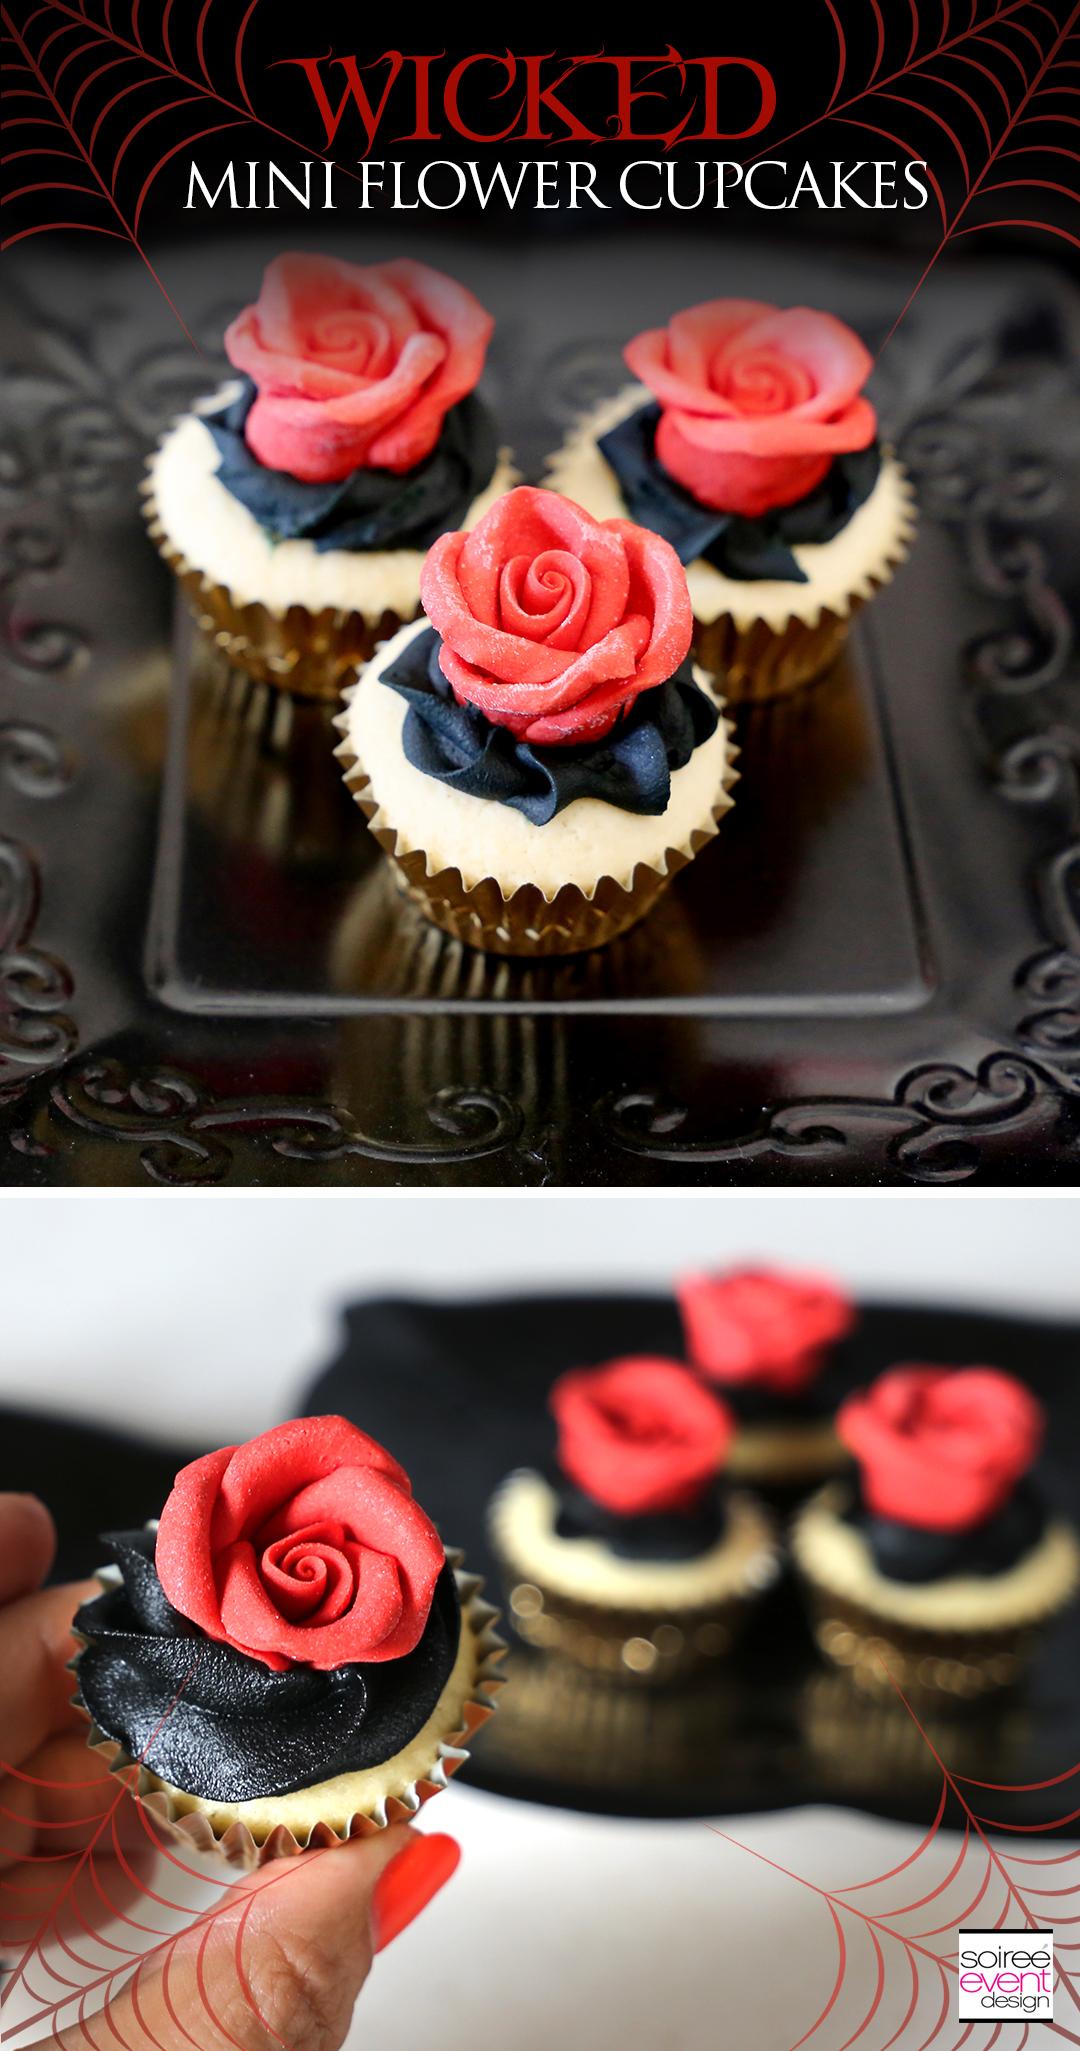 Wicked Mini Flower Cupcakes recipe